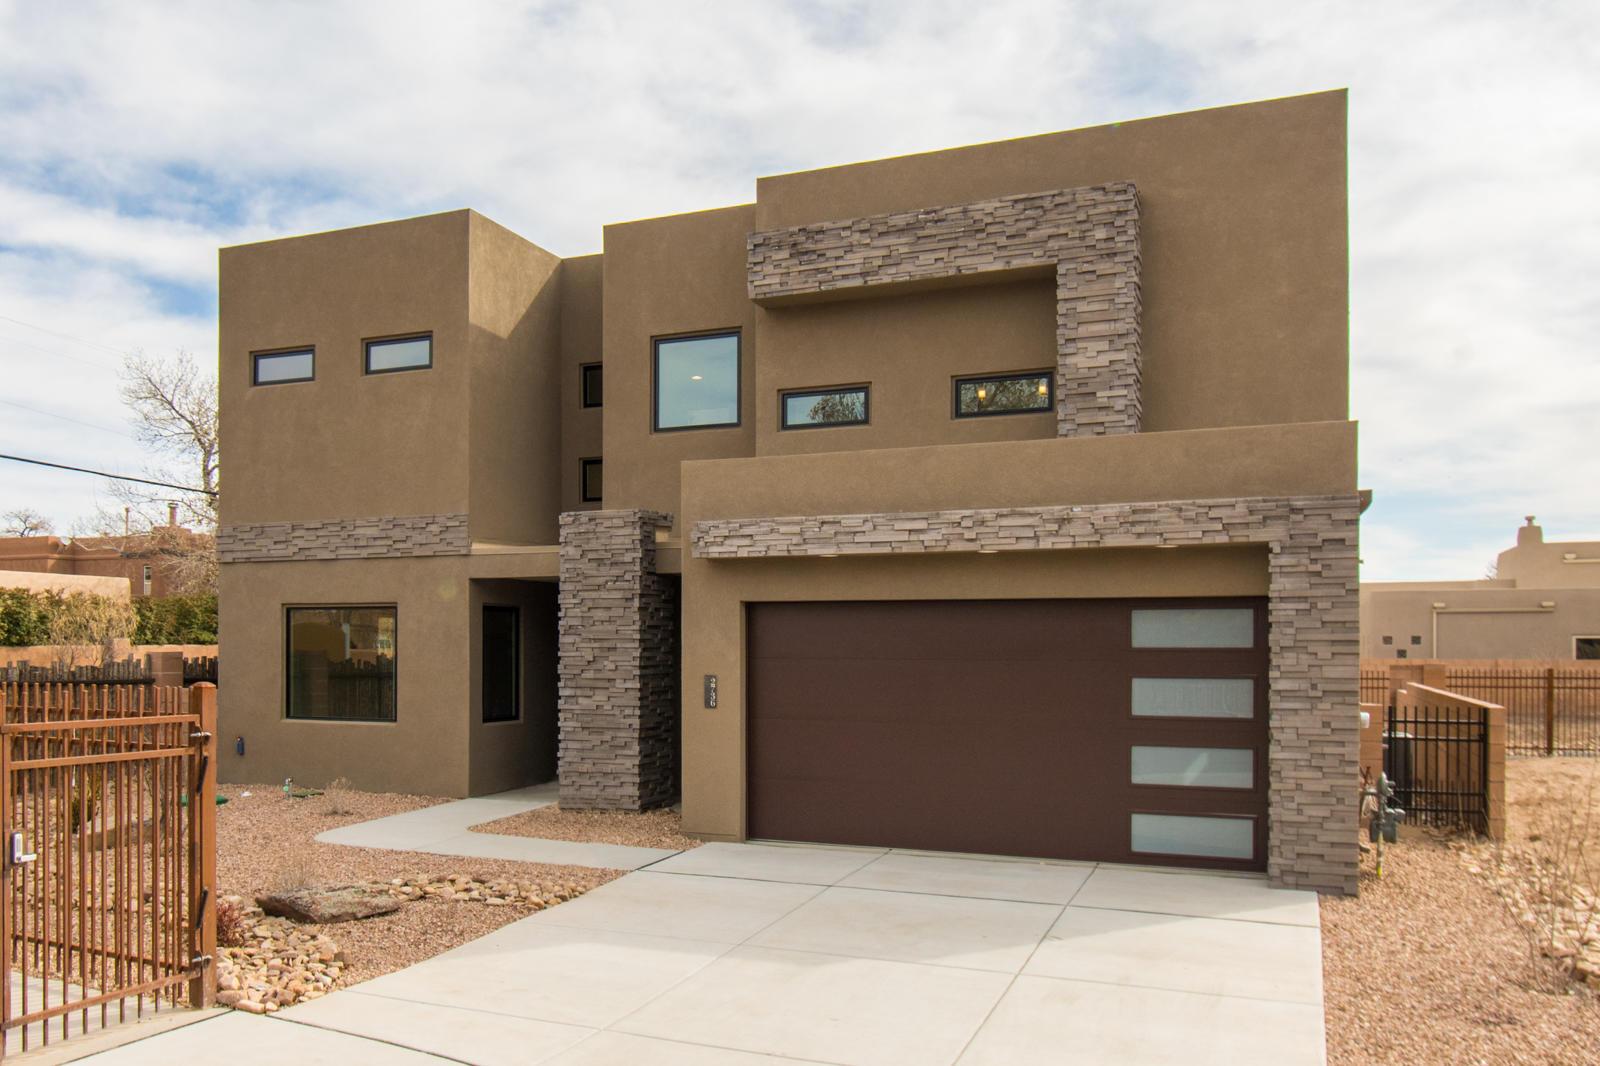 2732 PUERTA DEL BOSQUE Lane NW Property Photo - Albuquerque, NM real estate listing